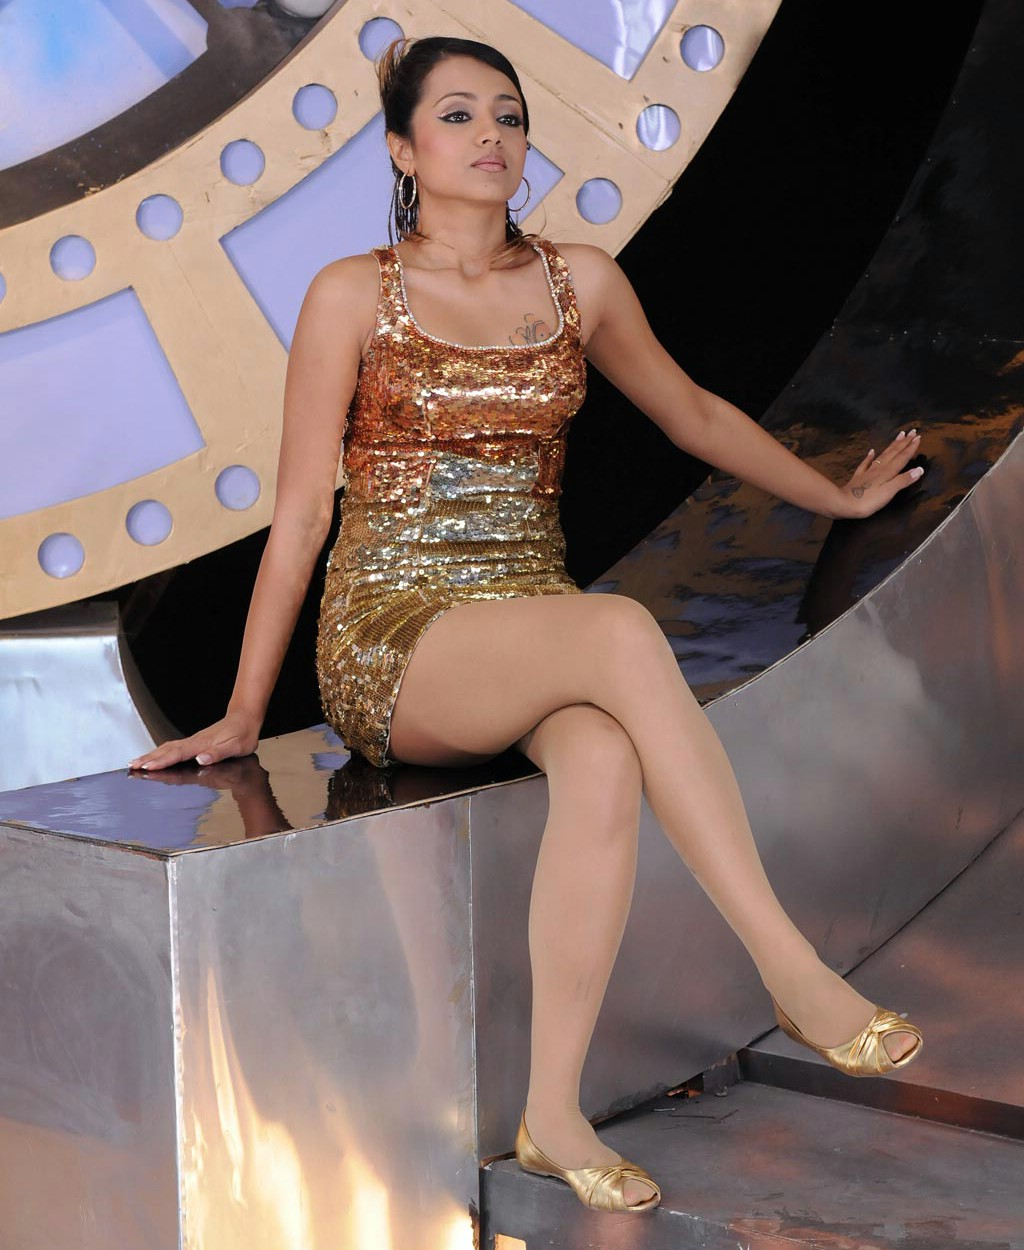 http://2.bp.blogspot.com/-0q9oZGUdsKA/UBKgelBY_nI/AAAAAAAAEtk/n1wNa_qryQs/s1600/Trisha14.jpg